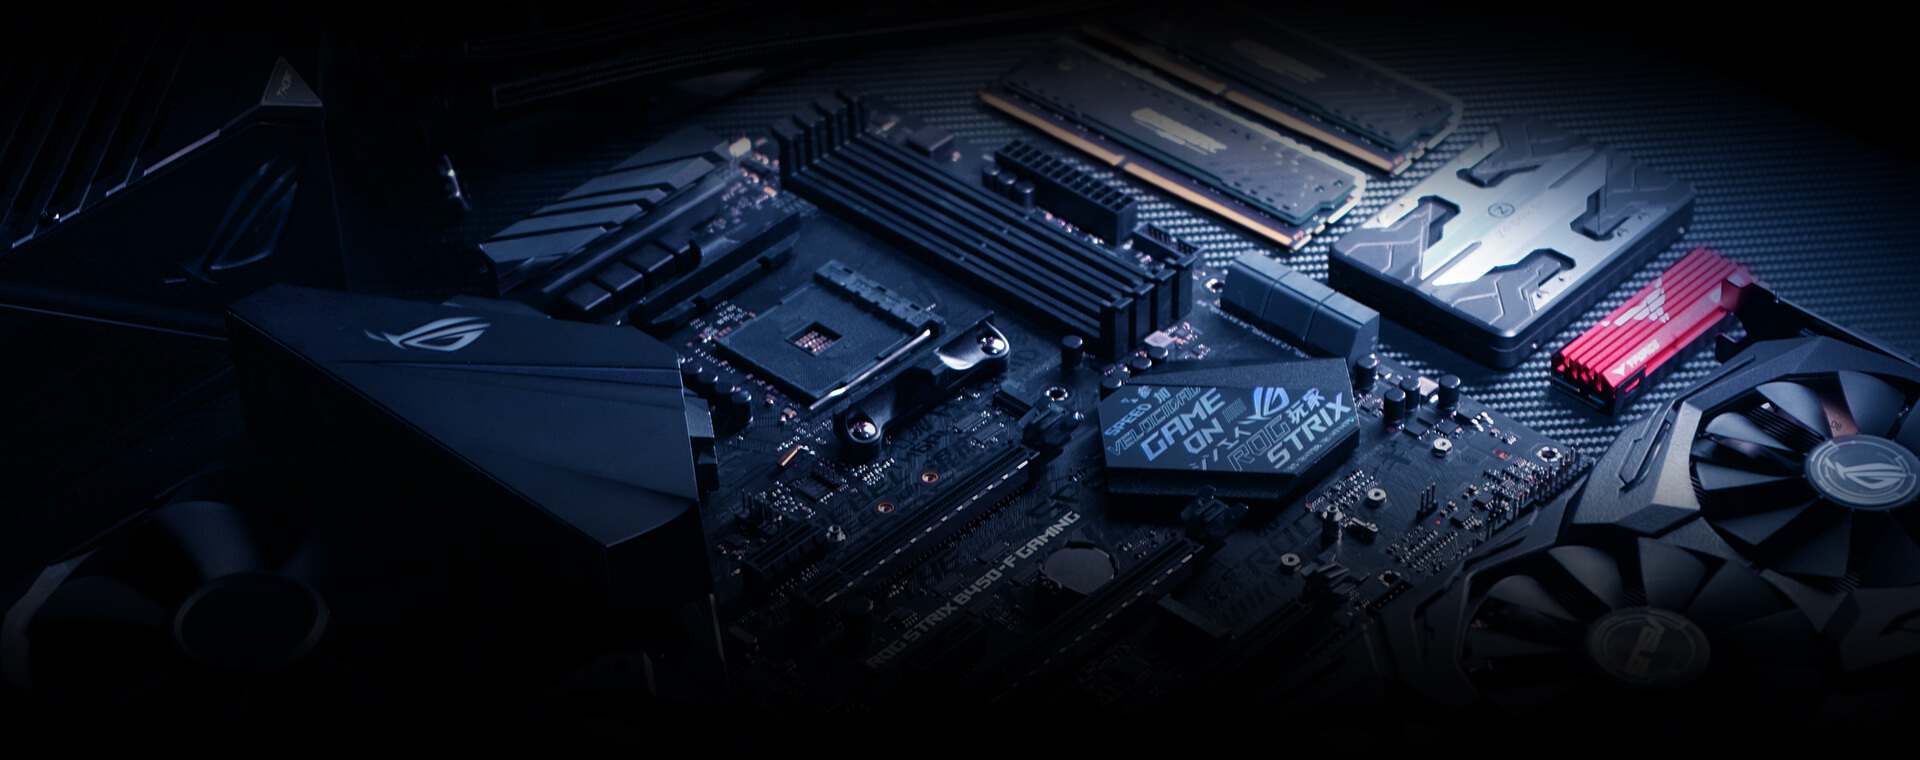 ASUS ROG STRIX B450-F GAMING Motherboard (Amd Socket AM4/Ryzen 2nd Gen  Series CPU/Max 64GB DDR4-3200MHz Memory)